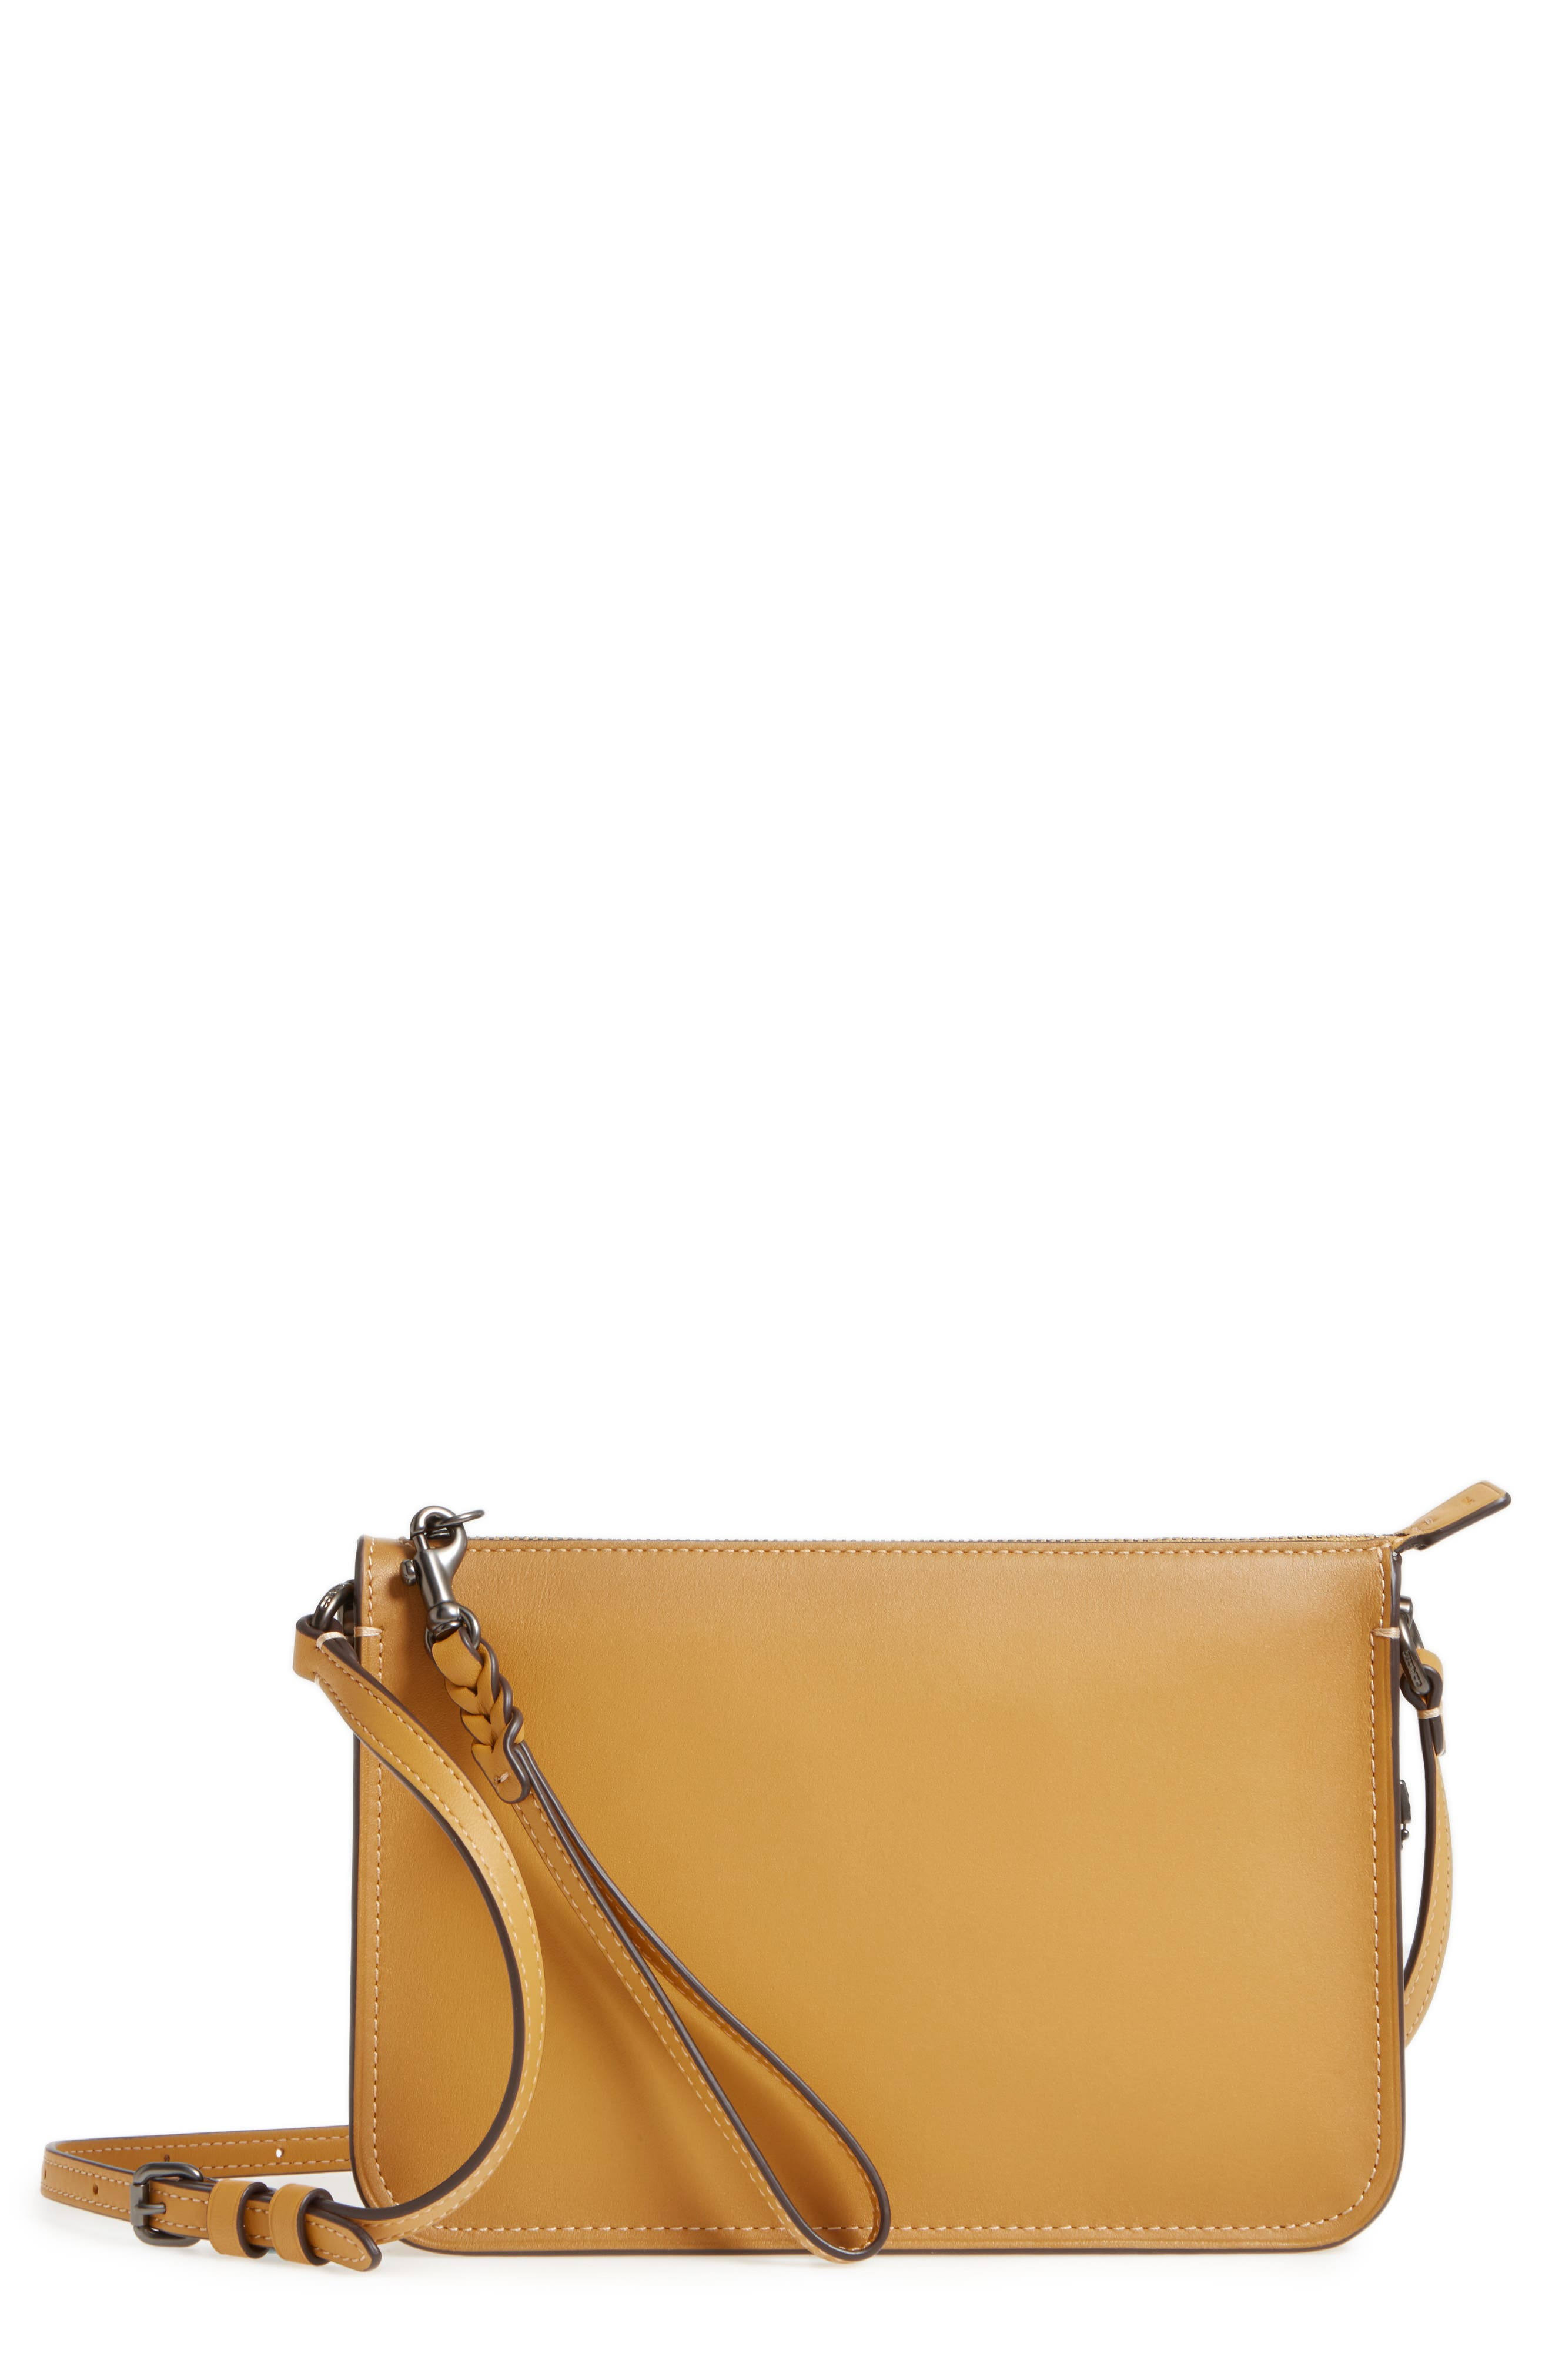 Alternate Image 1 Selected - COACH 1941 Soho Leather Crossbody Bag